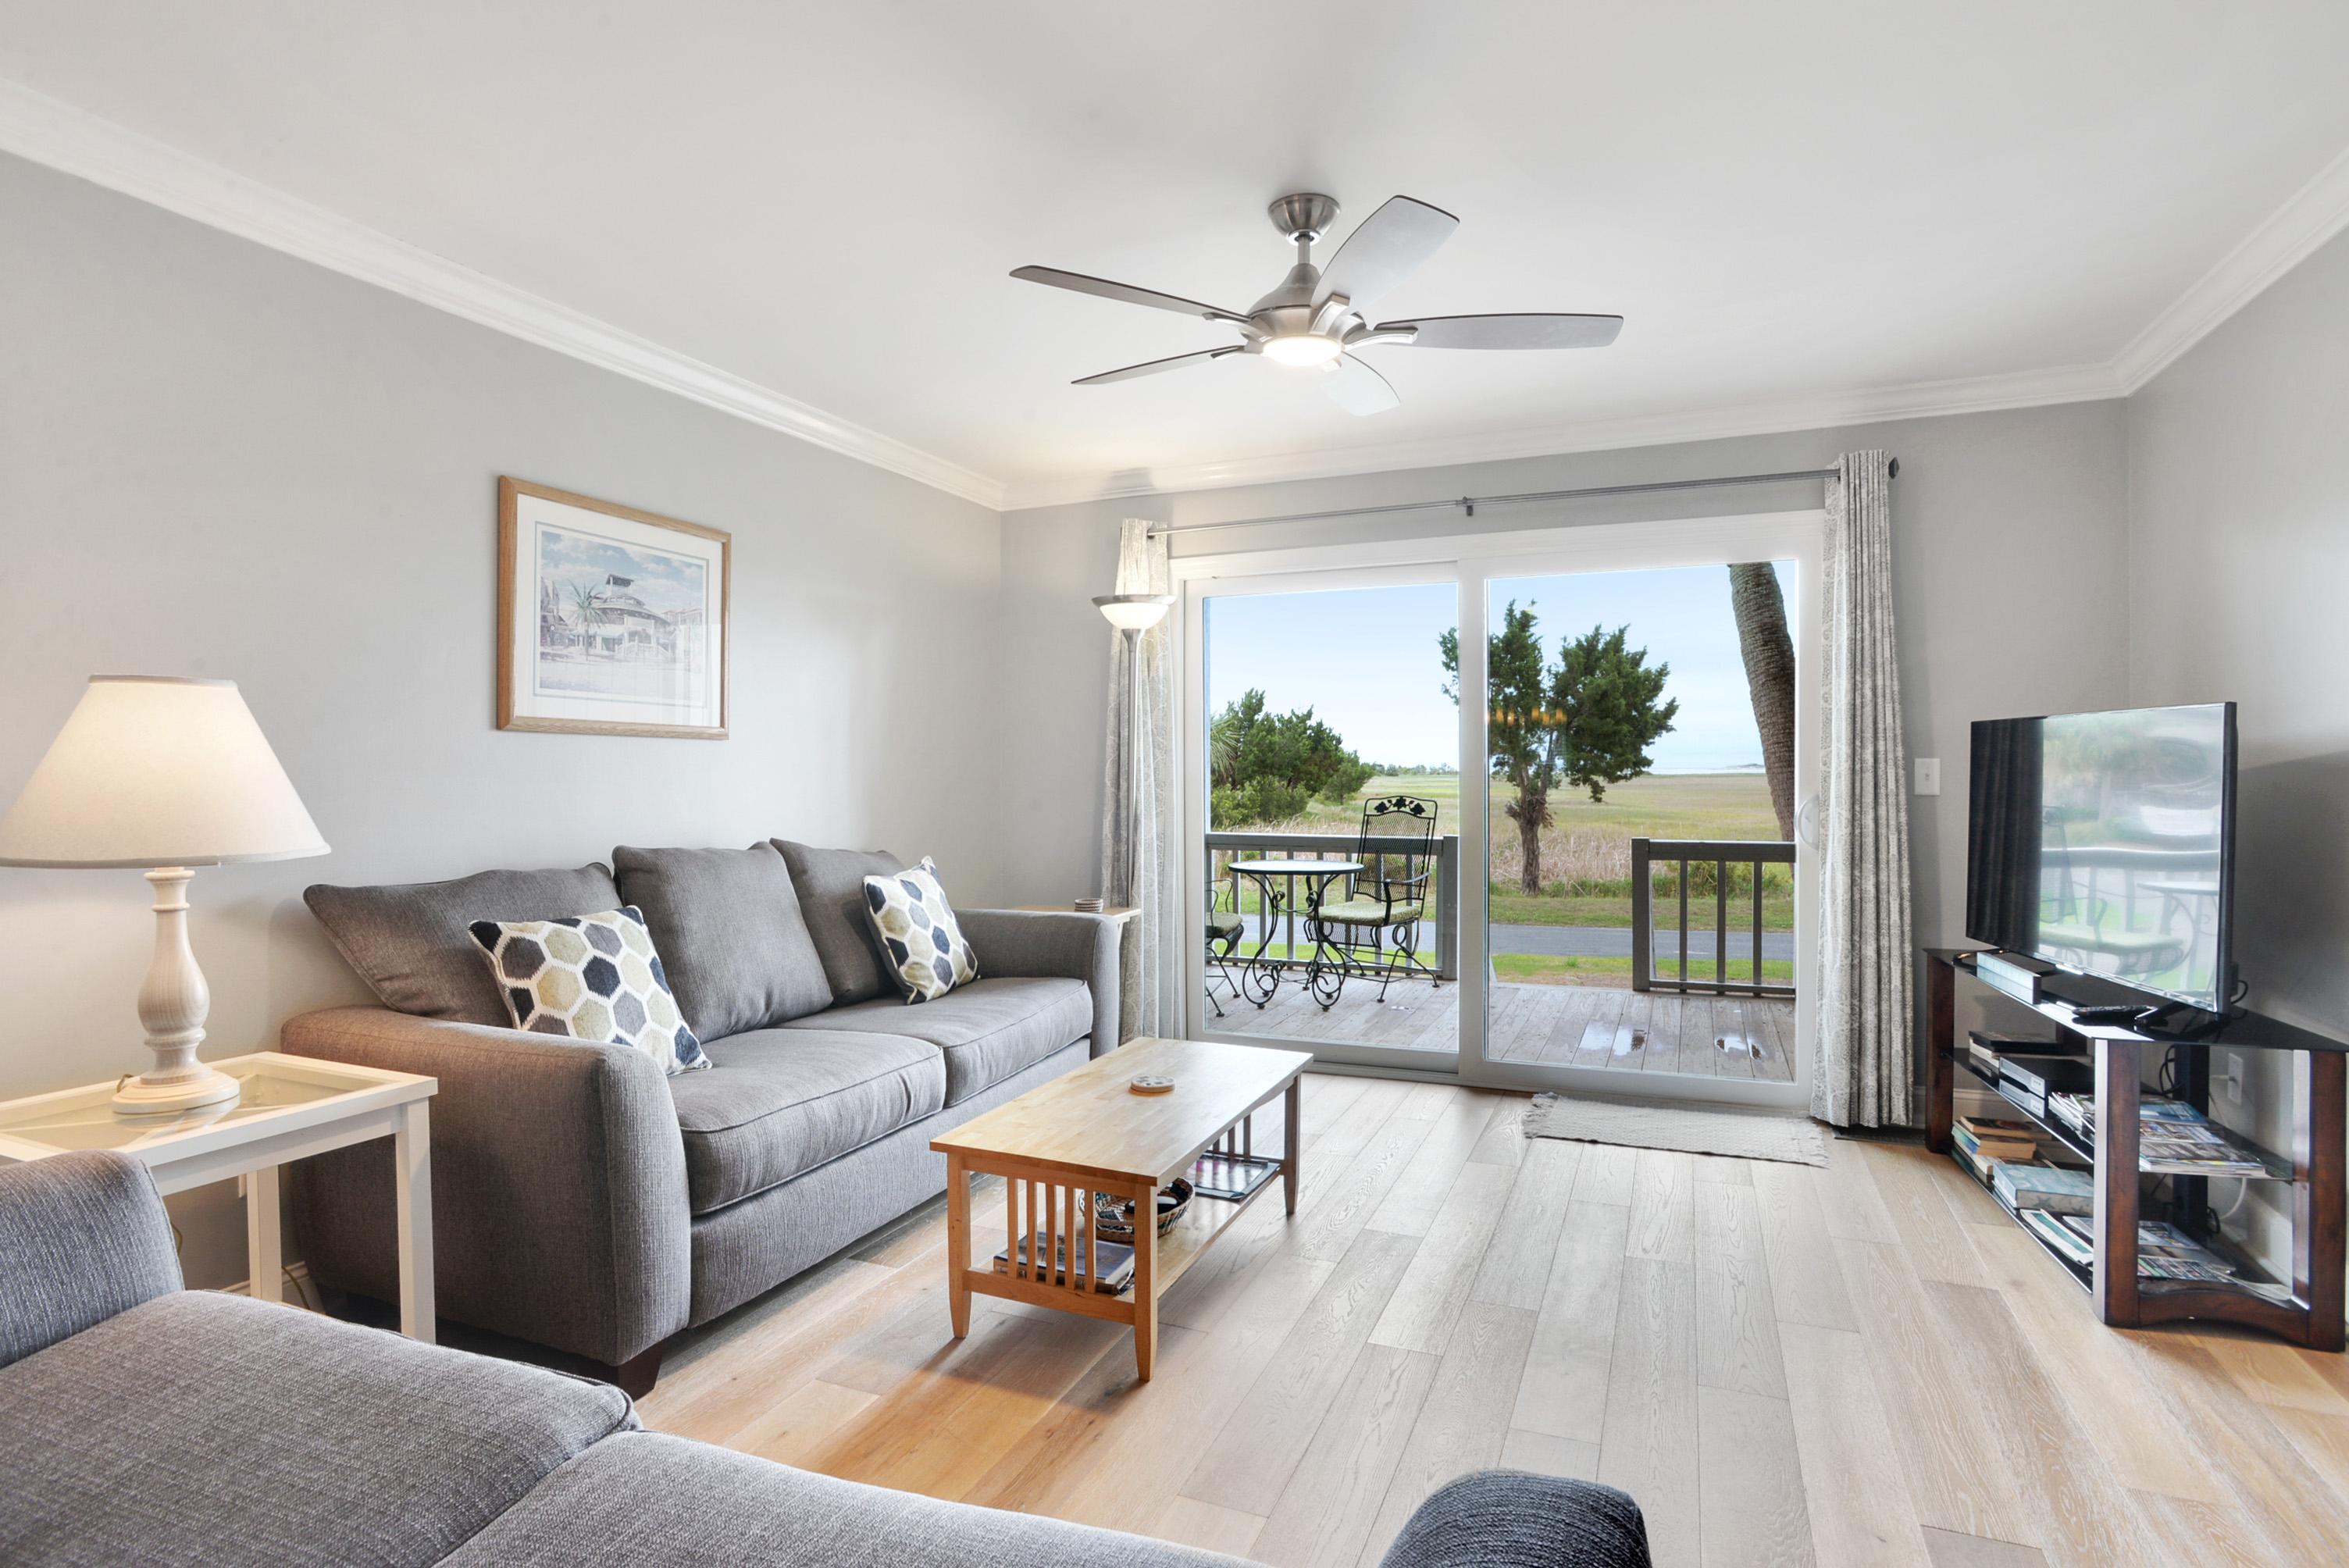 B104 Beach House Villa Beach Condo Vacation Rental On Harbor Island Sc Greater Beaufort Sc Vacation And Long Term Rentals